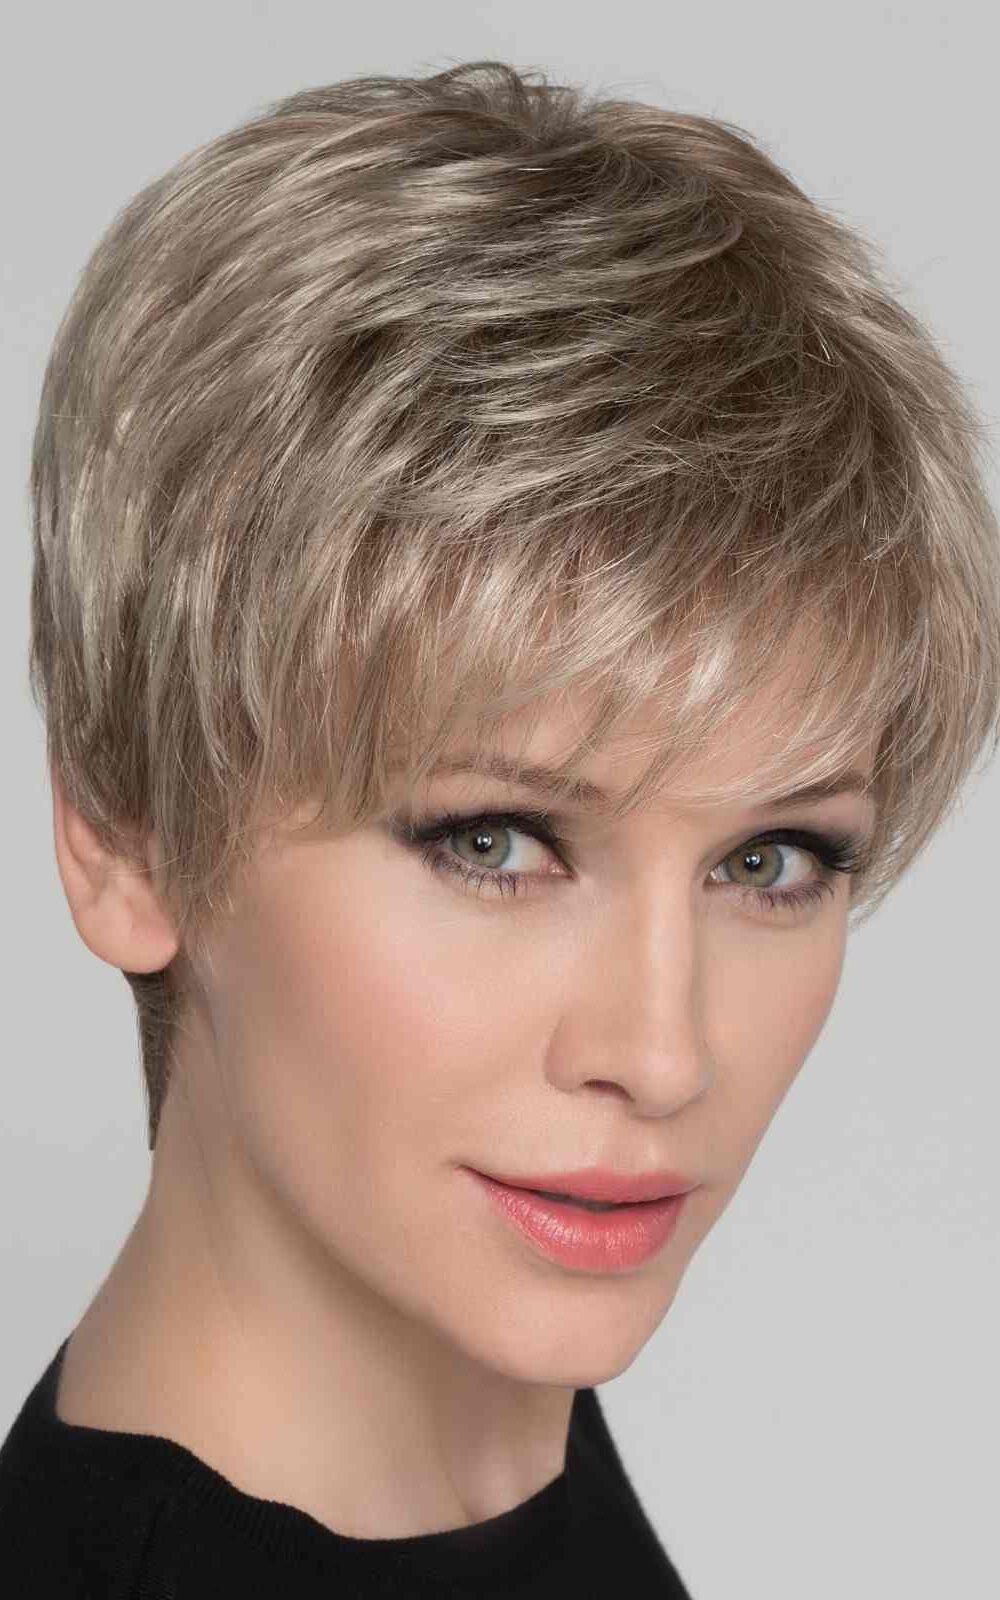 Carol Mono | Synthetic Lace Front Wig (Mono Top) by Ellen Wille | Sandy Blonde Mix | Elly-K.com.au